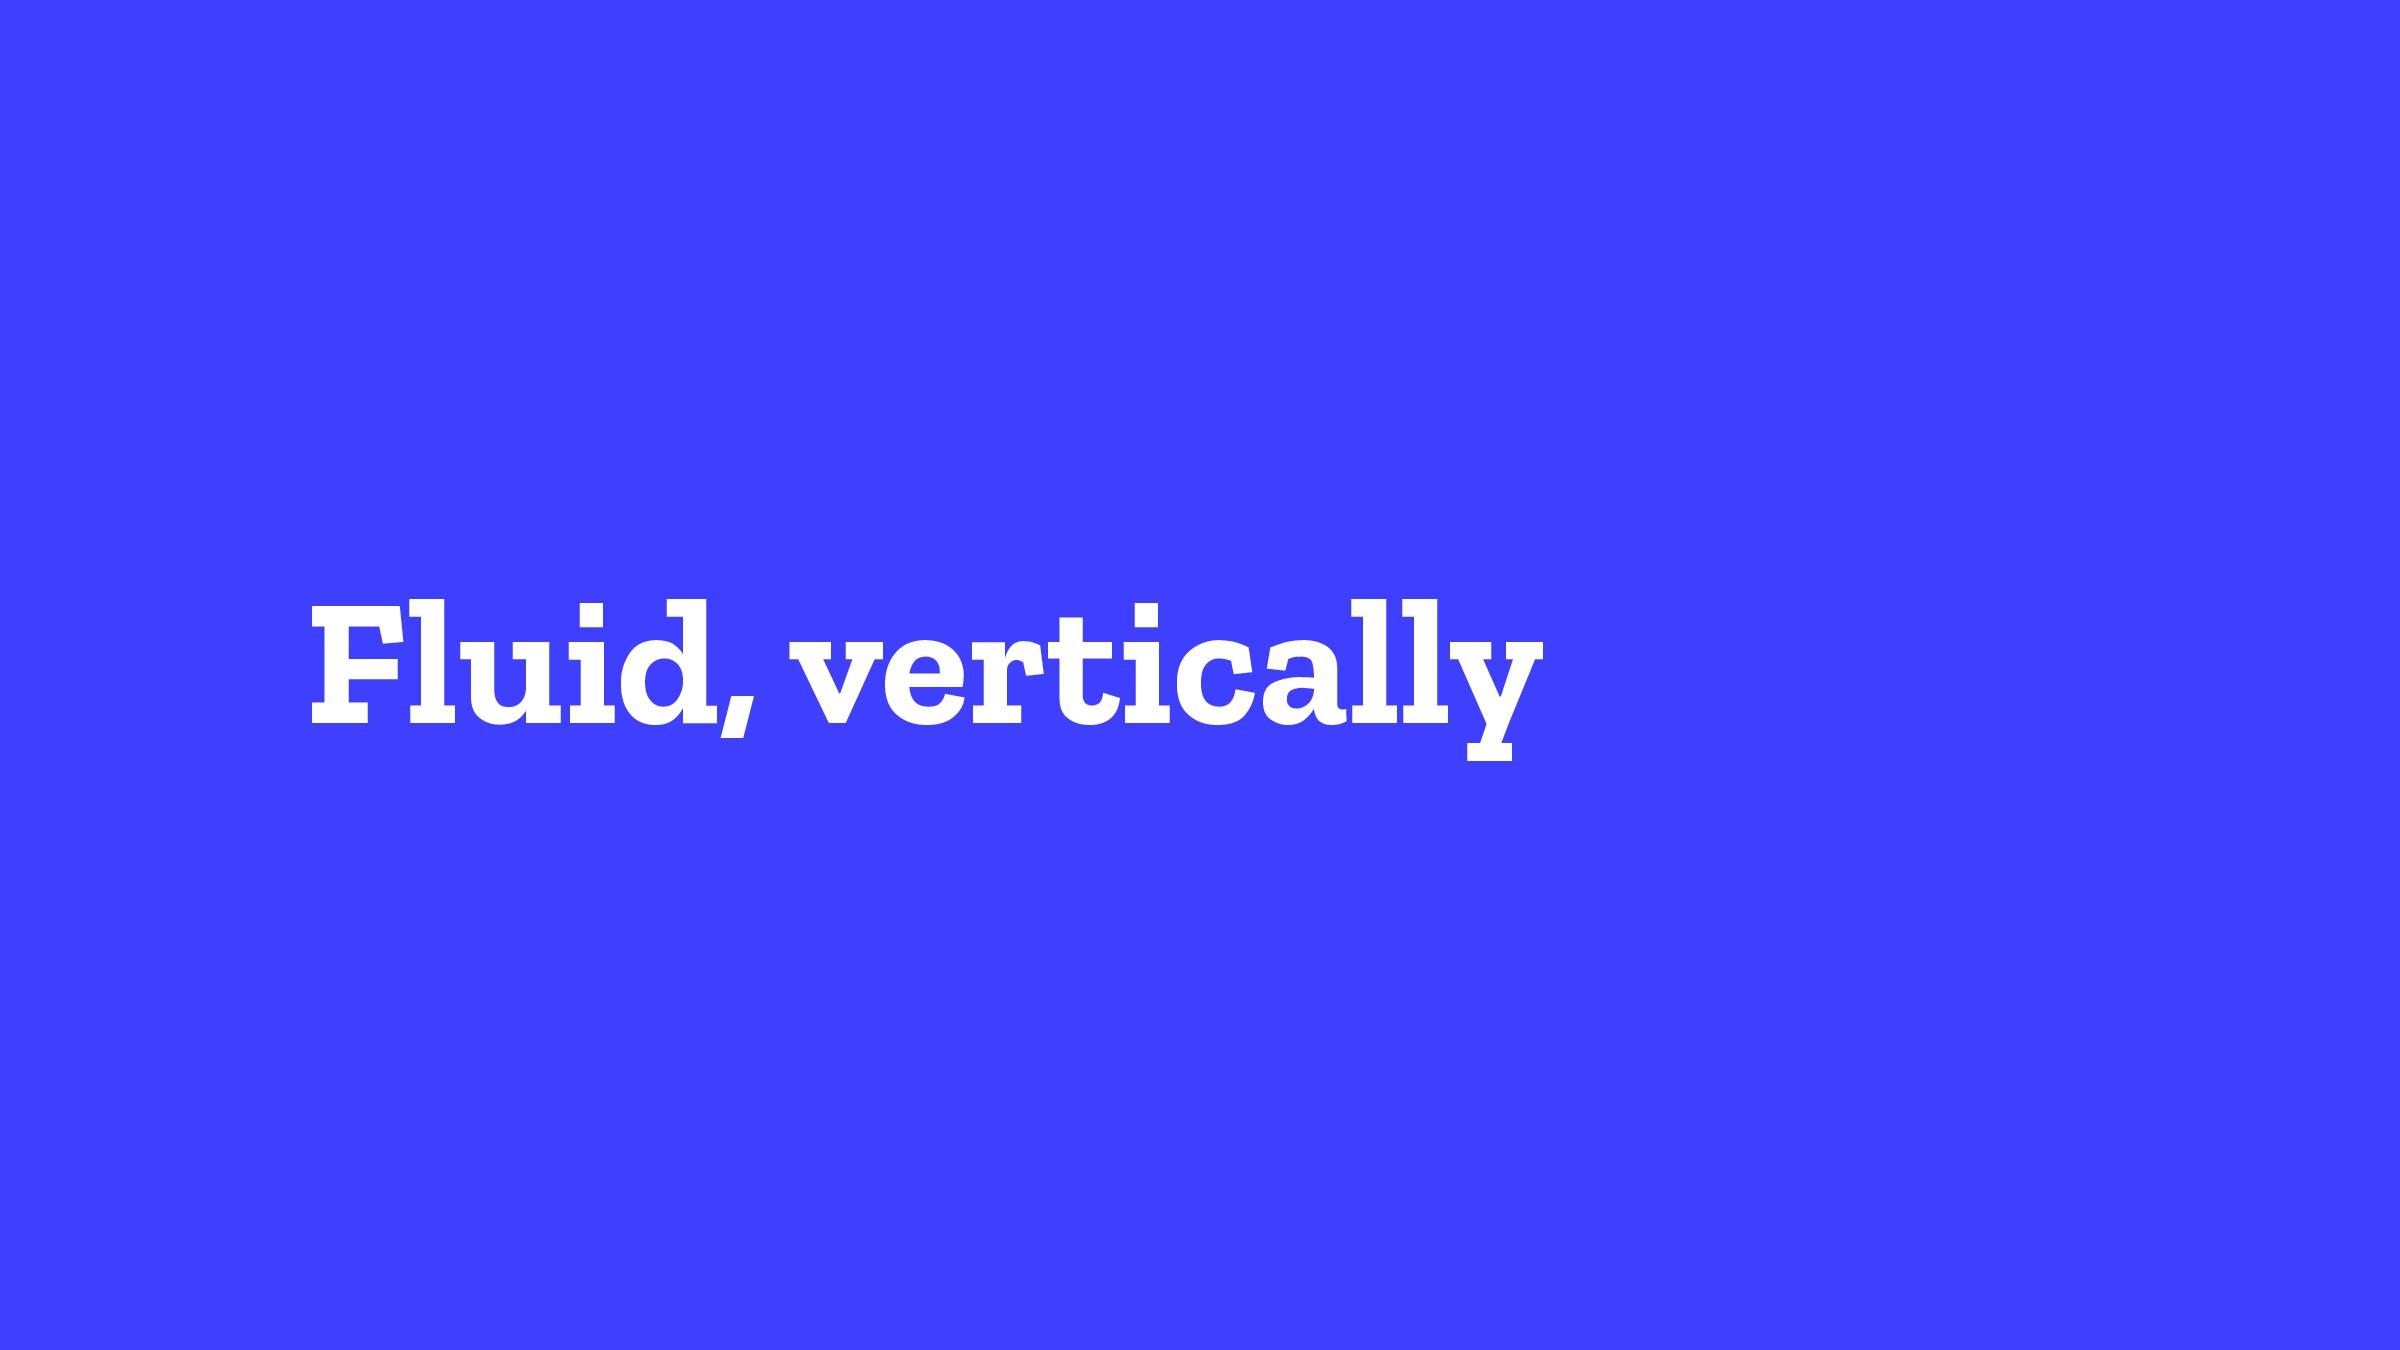 Fluid, vertically